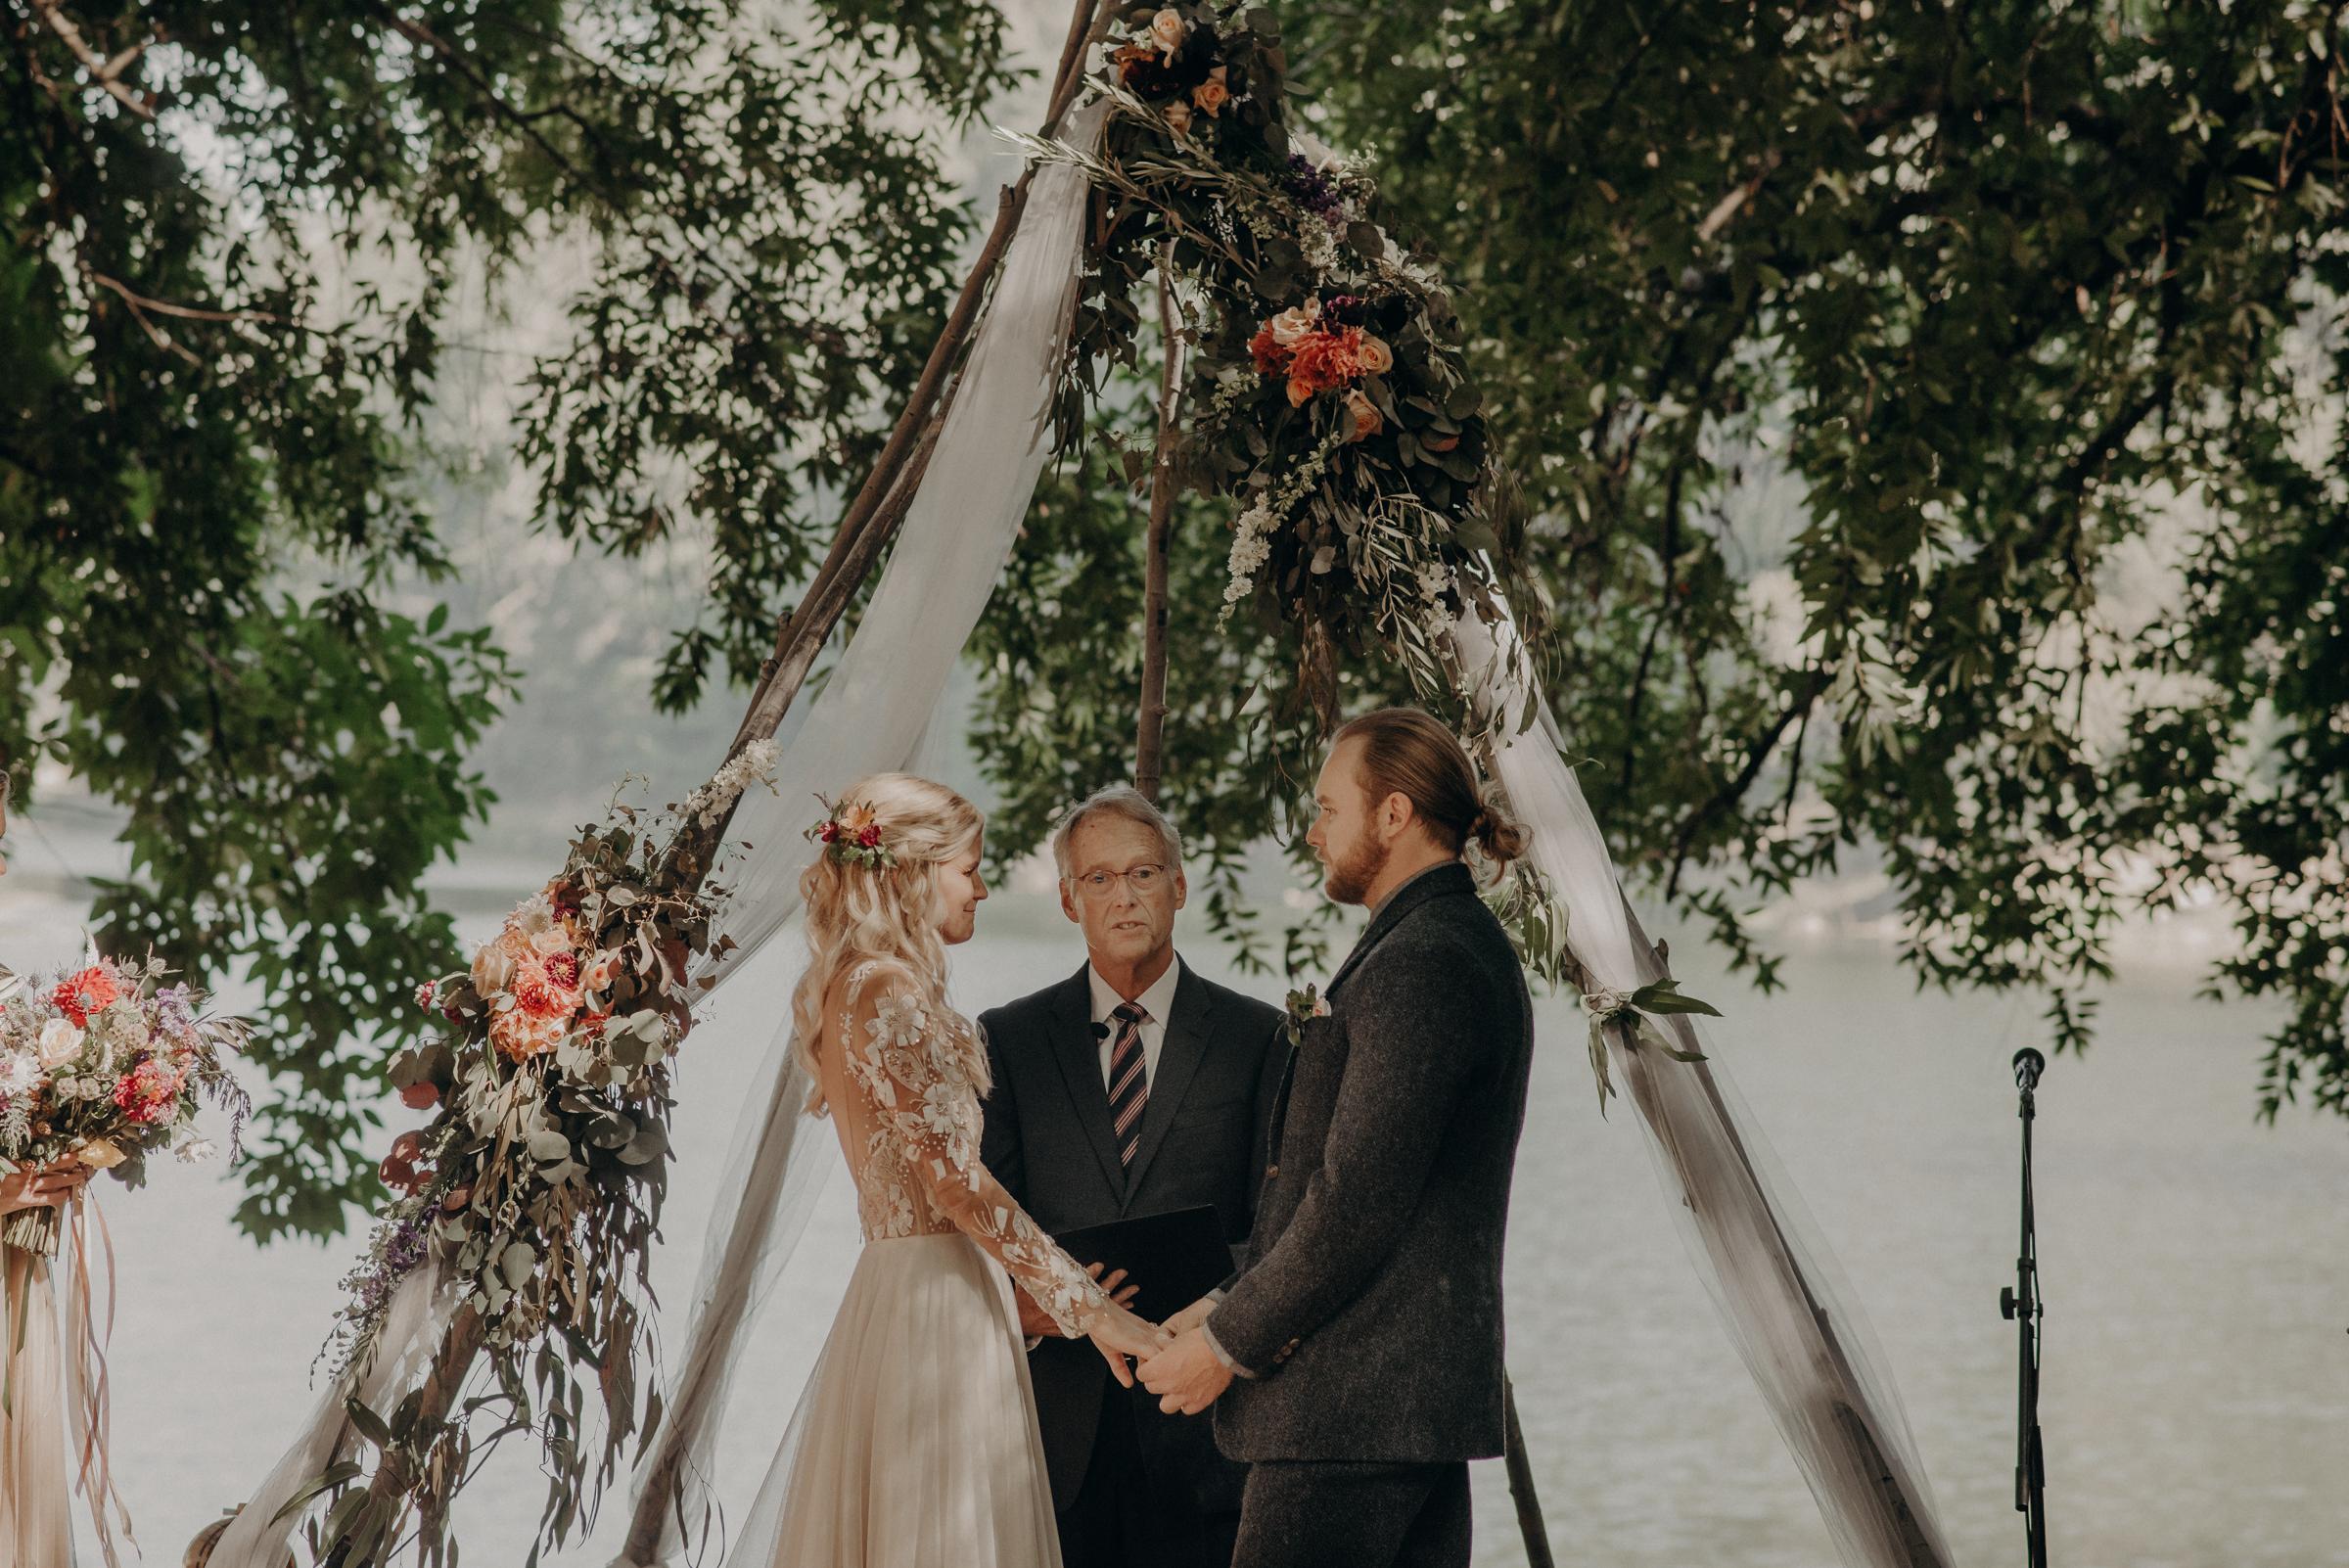 IsaiahAndTaylor.com - California Destination Elopement, Lake Leonard Reserve Wedding, Ukiah-095.jpg